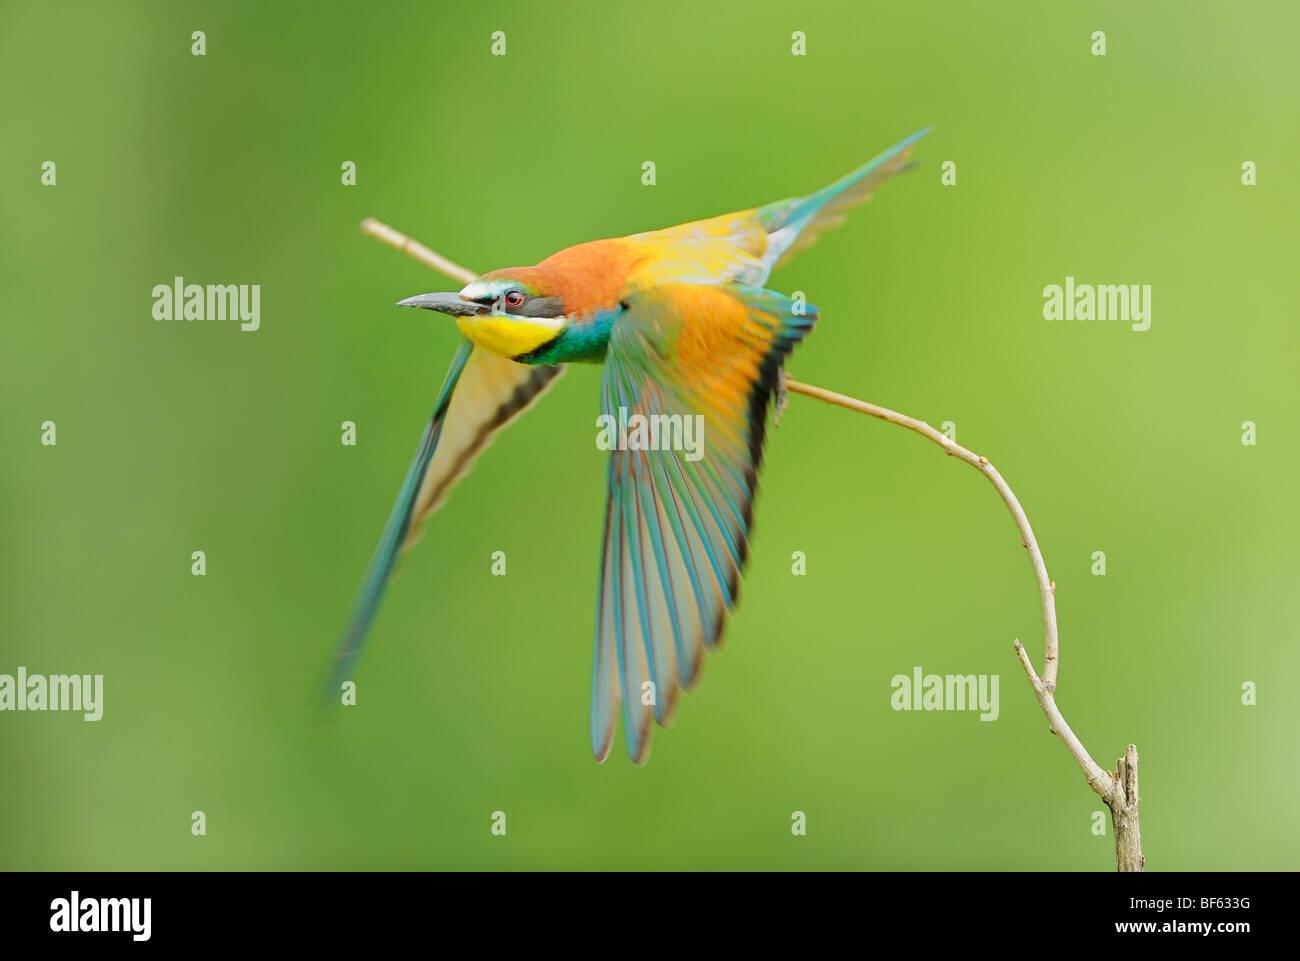 European Bee-eater (Merops apiaster), adult take off, Hungary, Europe Stock Photo